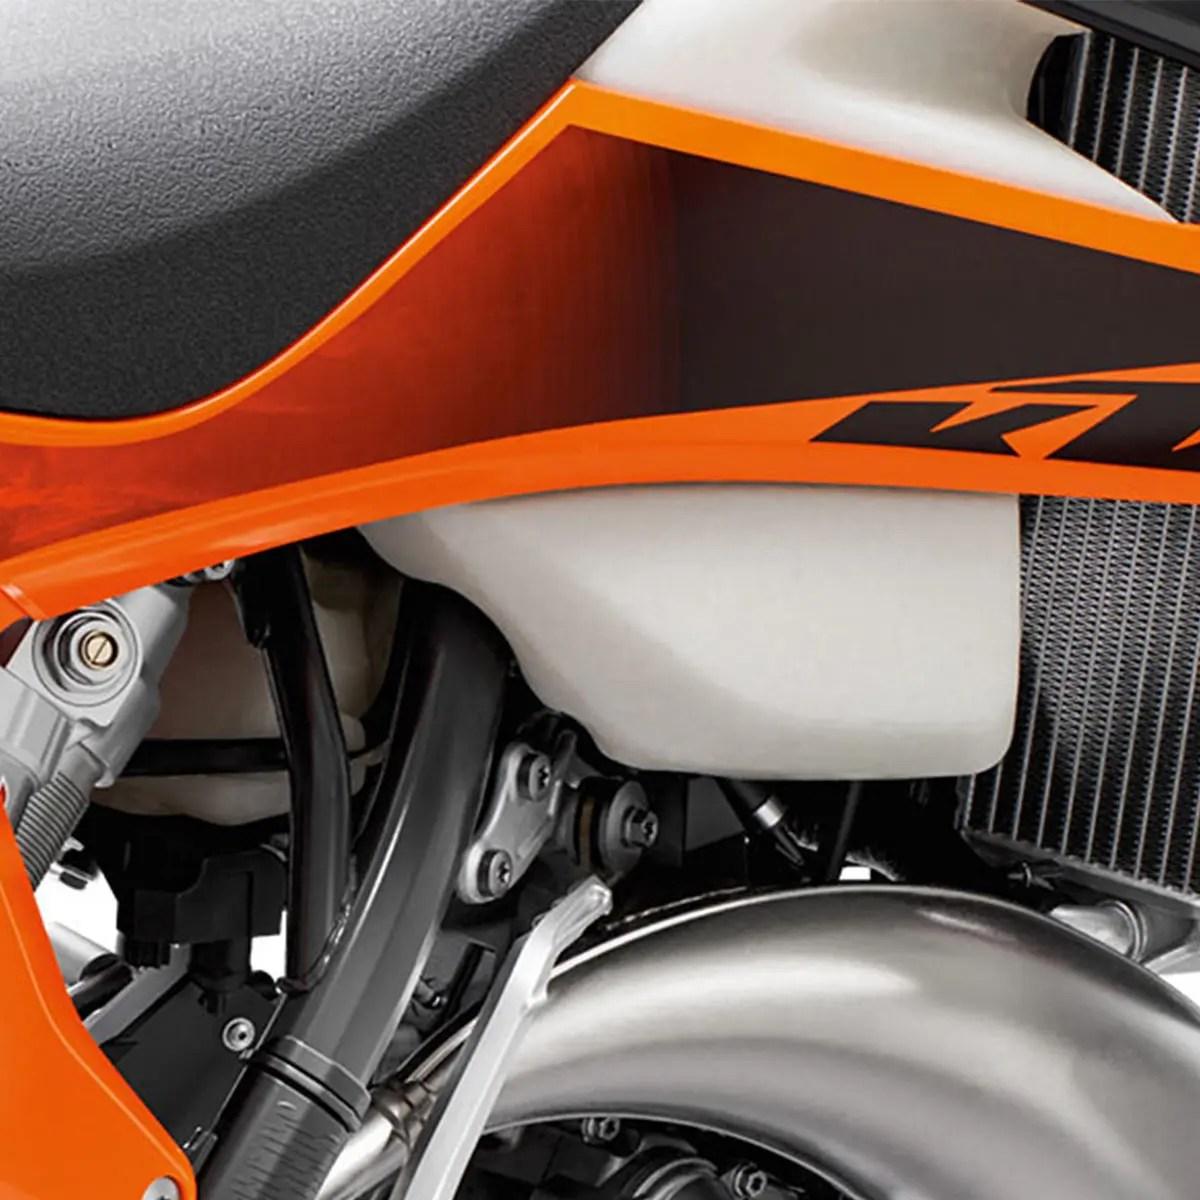 AUTOCOLLANTS-KTM-150-EXC-TPI-2020